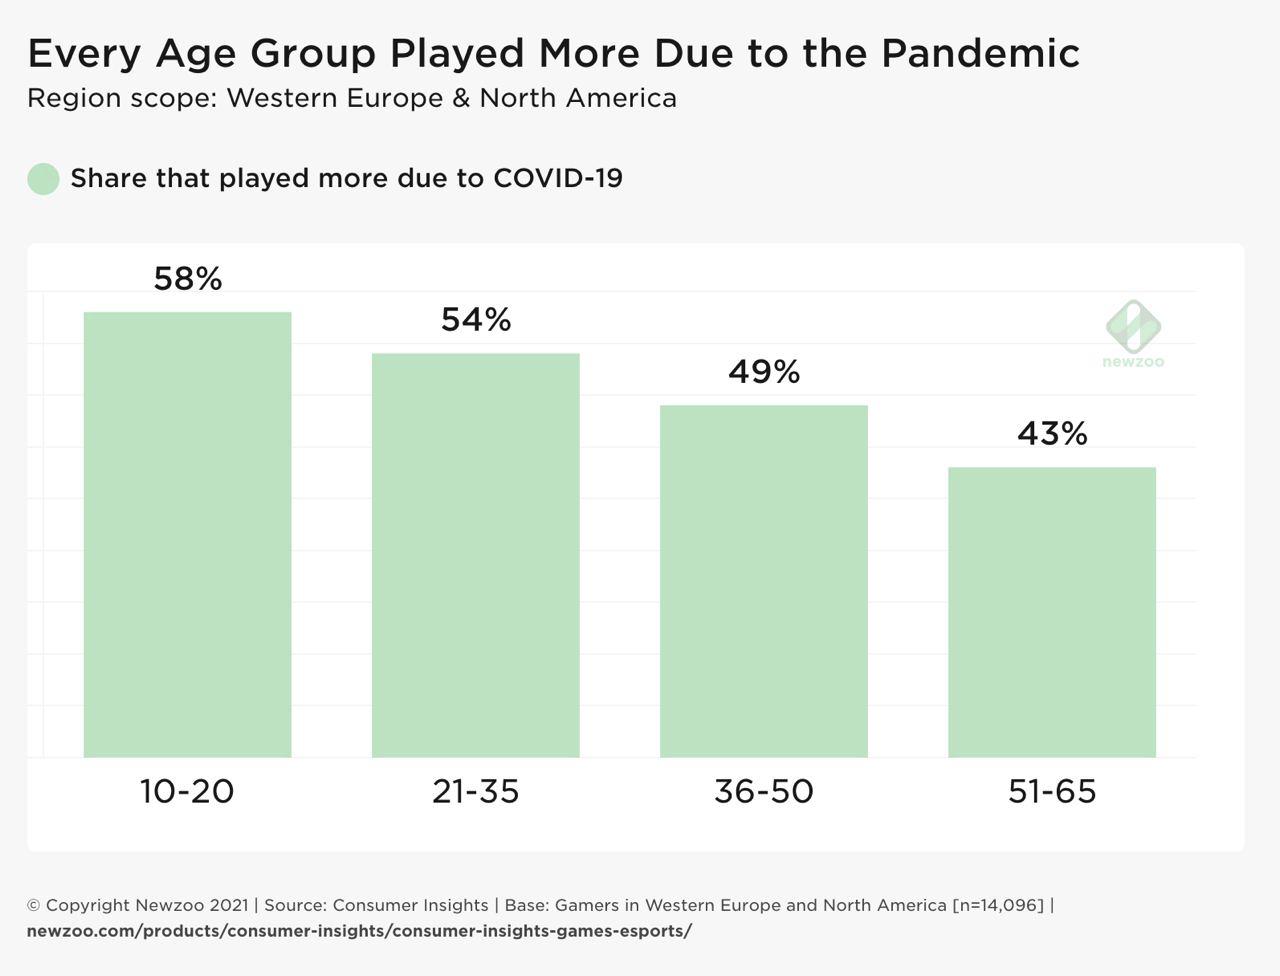 Covid19 playtime impact